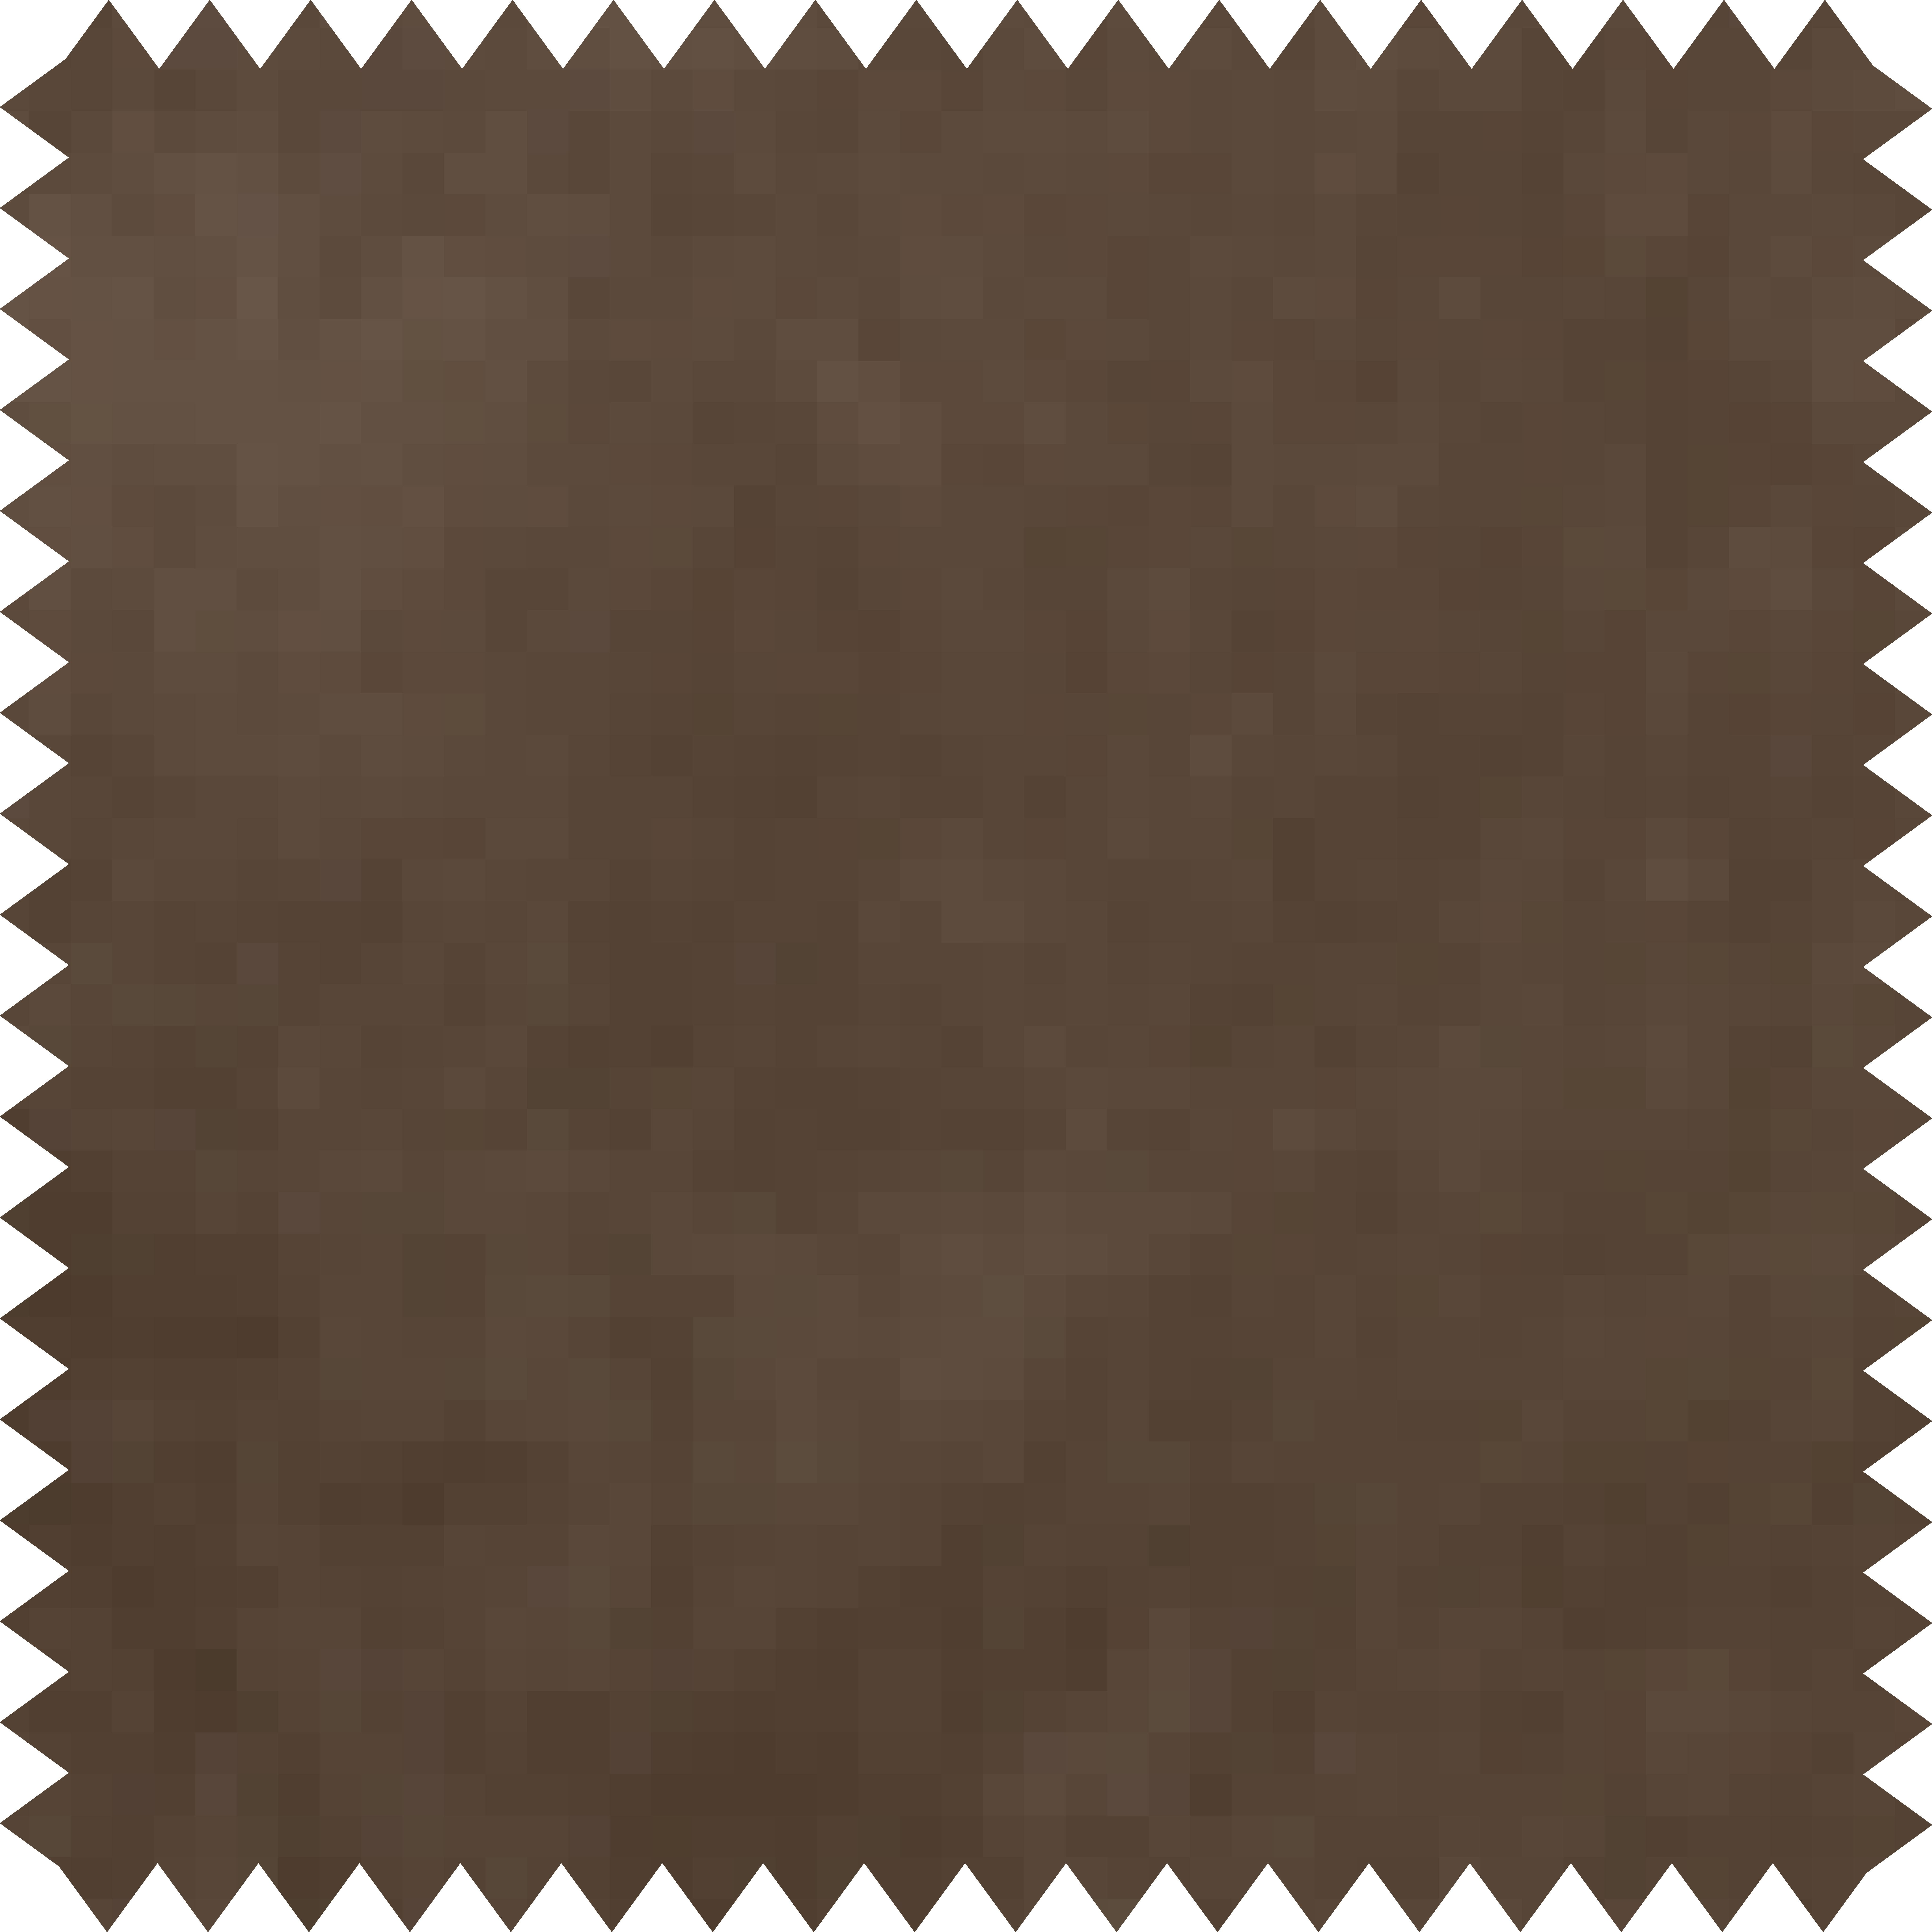 Kleur sta-op stoel - Cacao